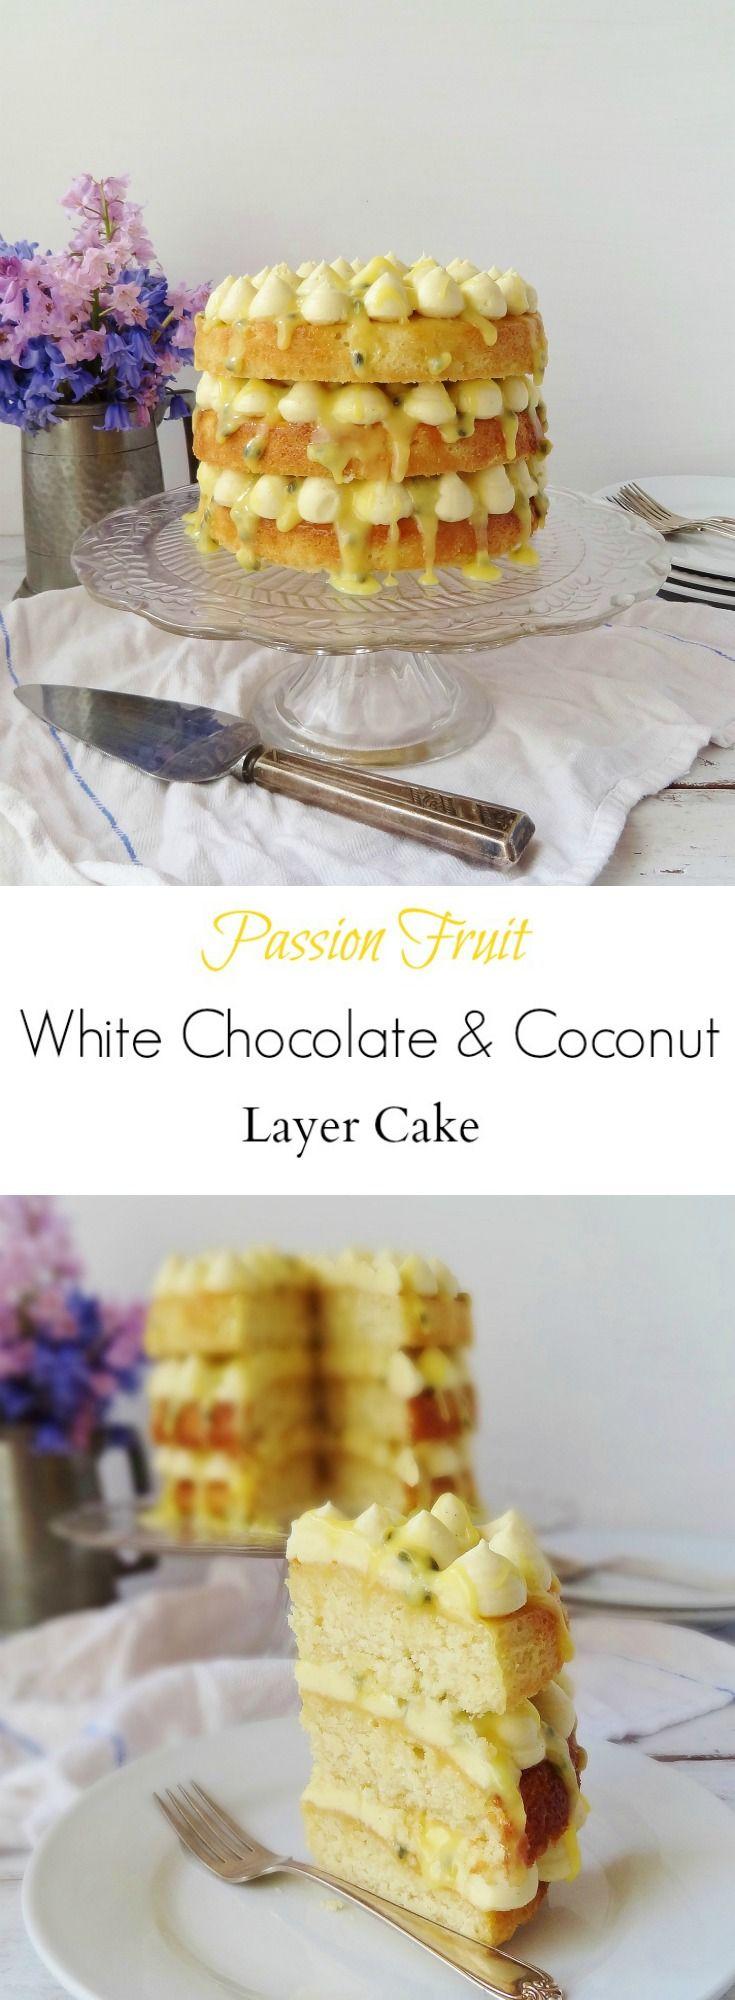 The 665 best Cake Recipes images on Pinterest | Cake, Cake recipes ...